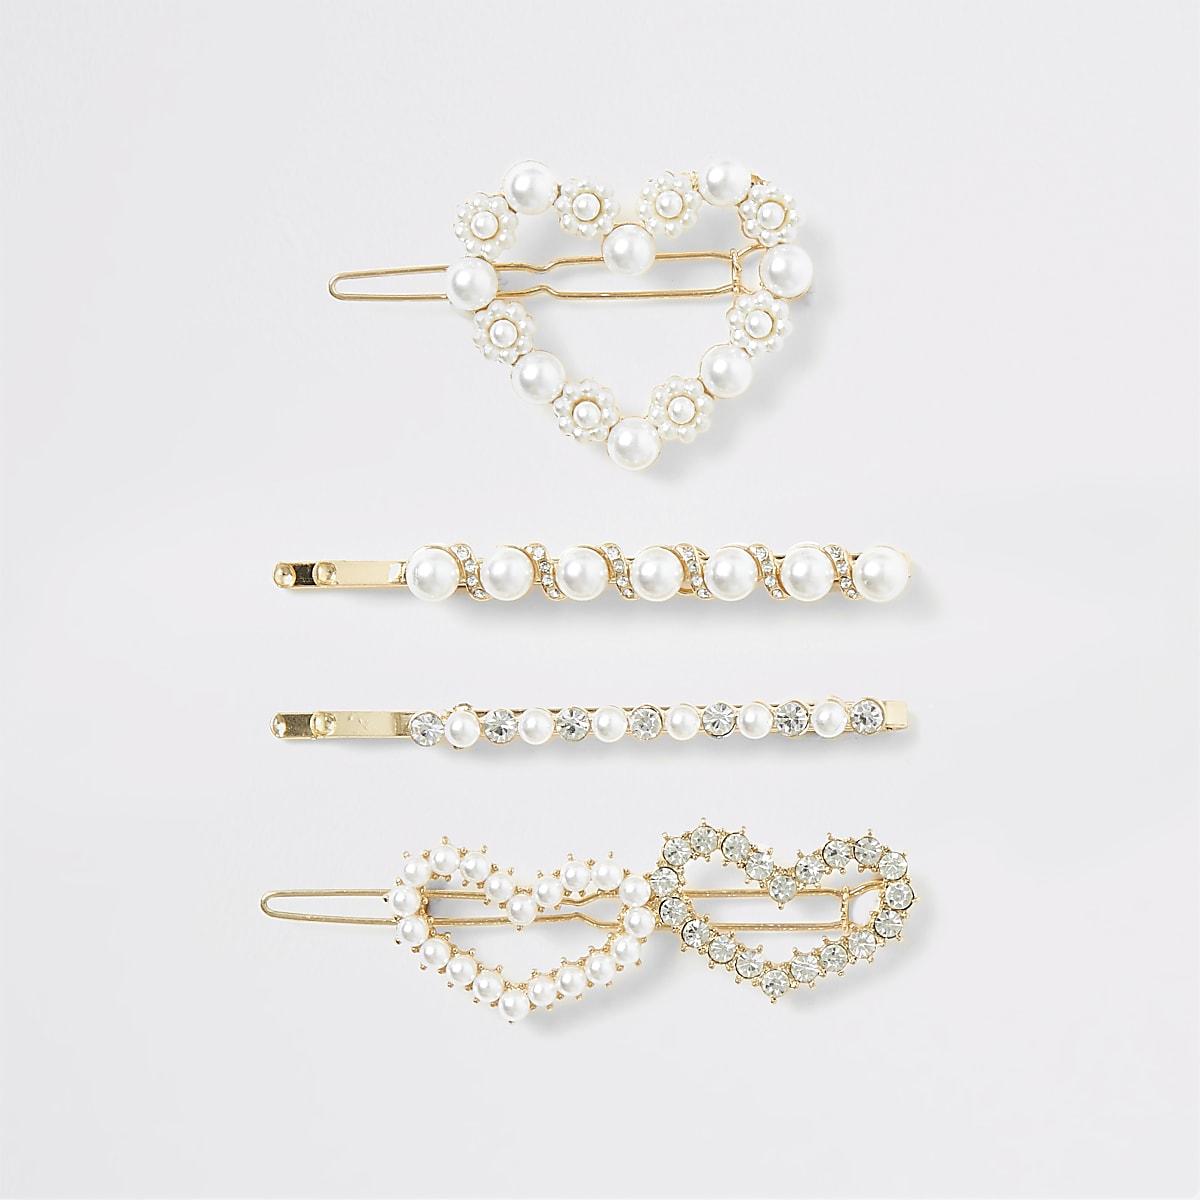 Multipack met goudkleurige haarspeldjes met hartjes met parels